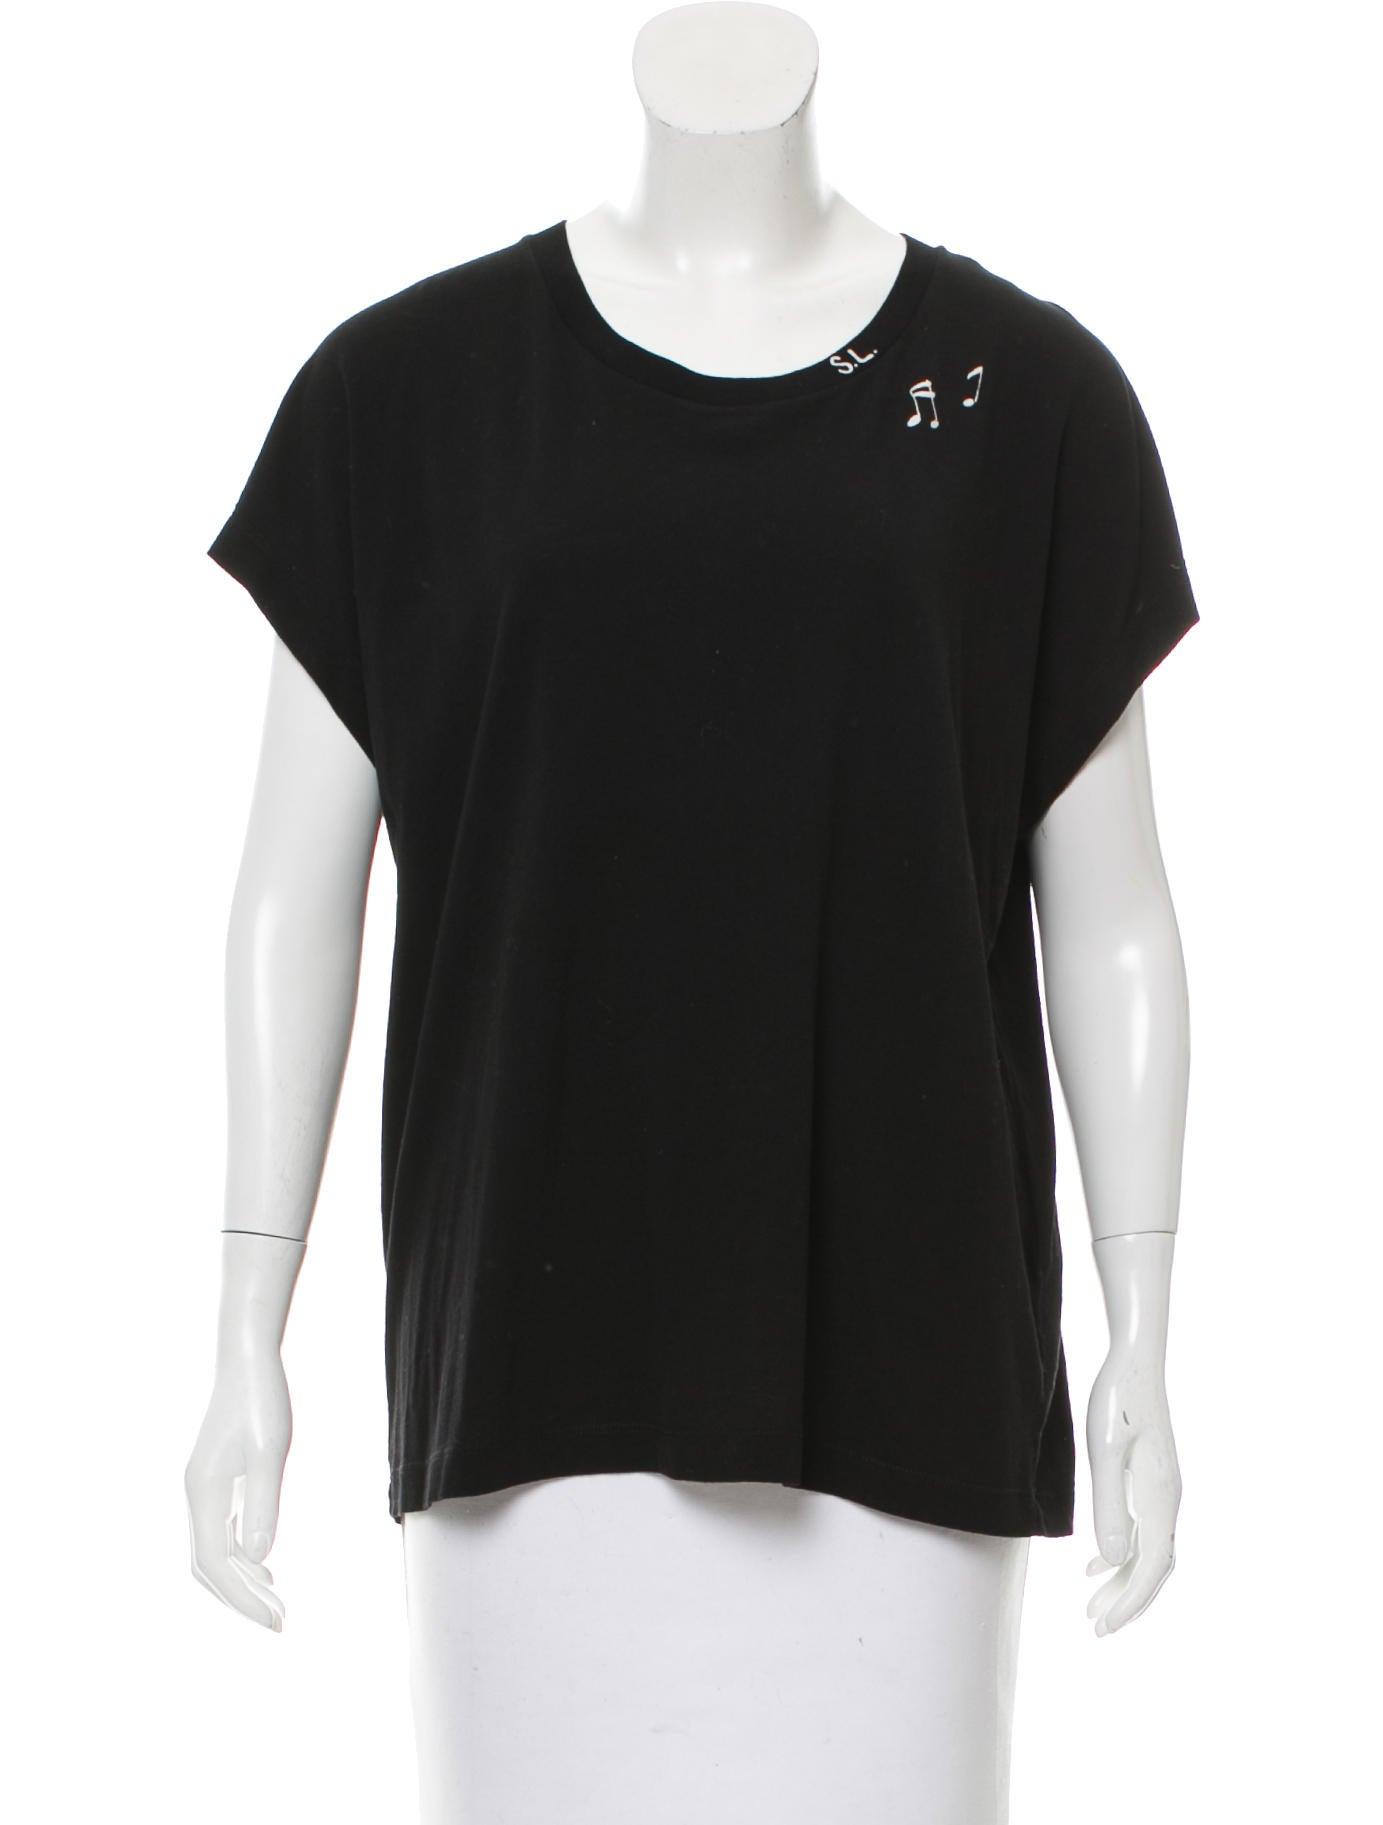 Saint laurent short sleeve graphic t shirt clothing for Saint laurent shirt womens